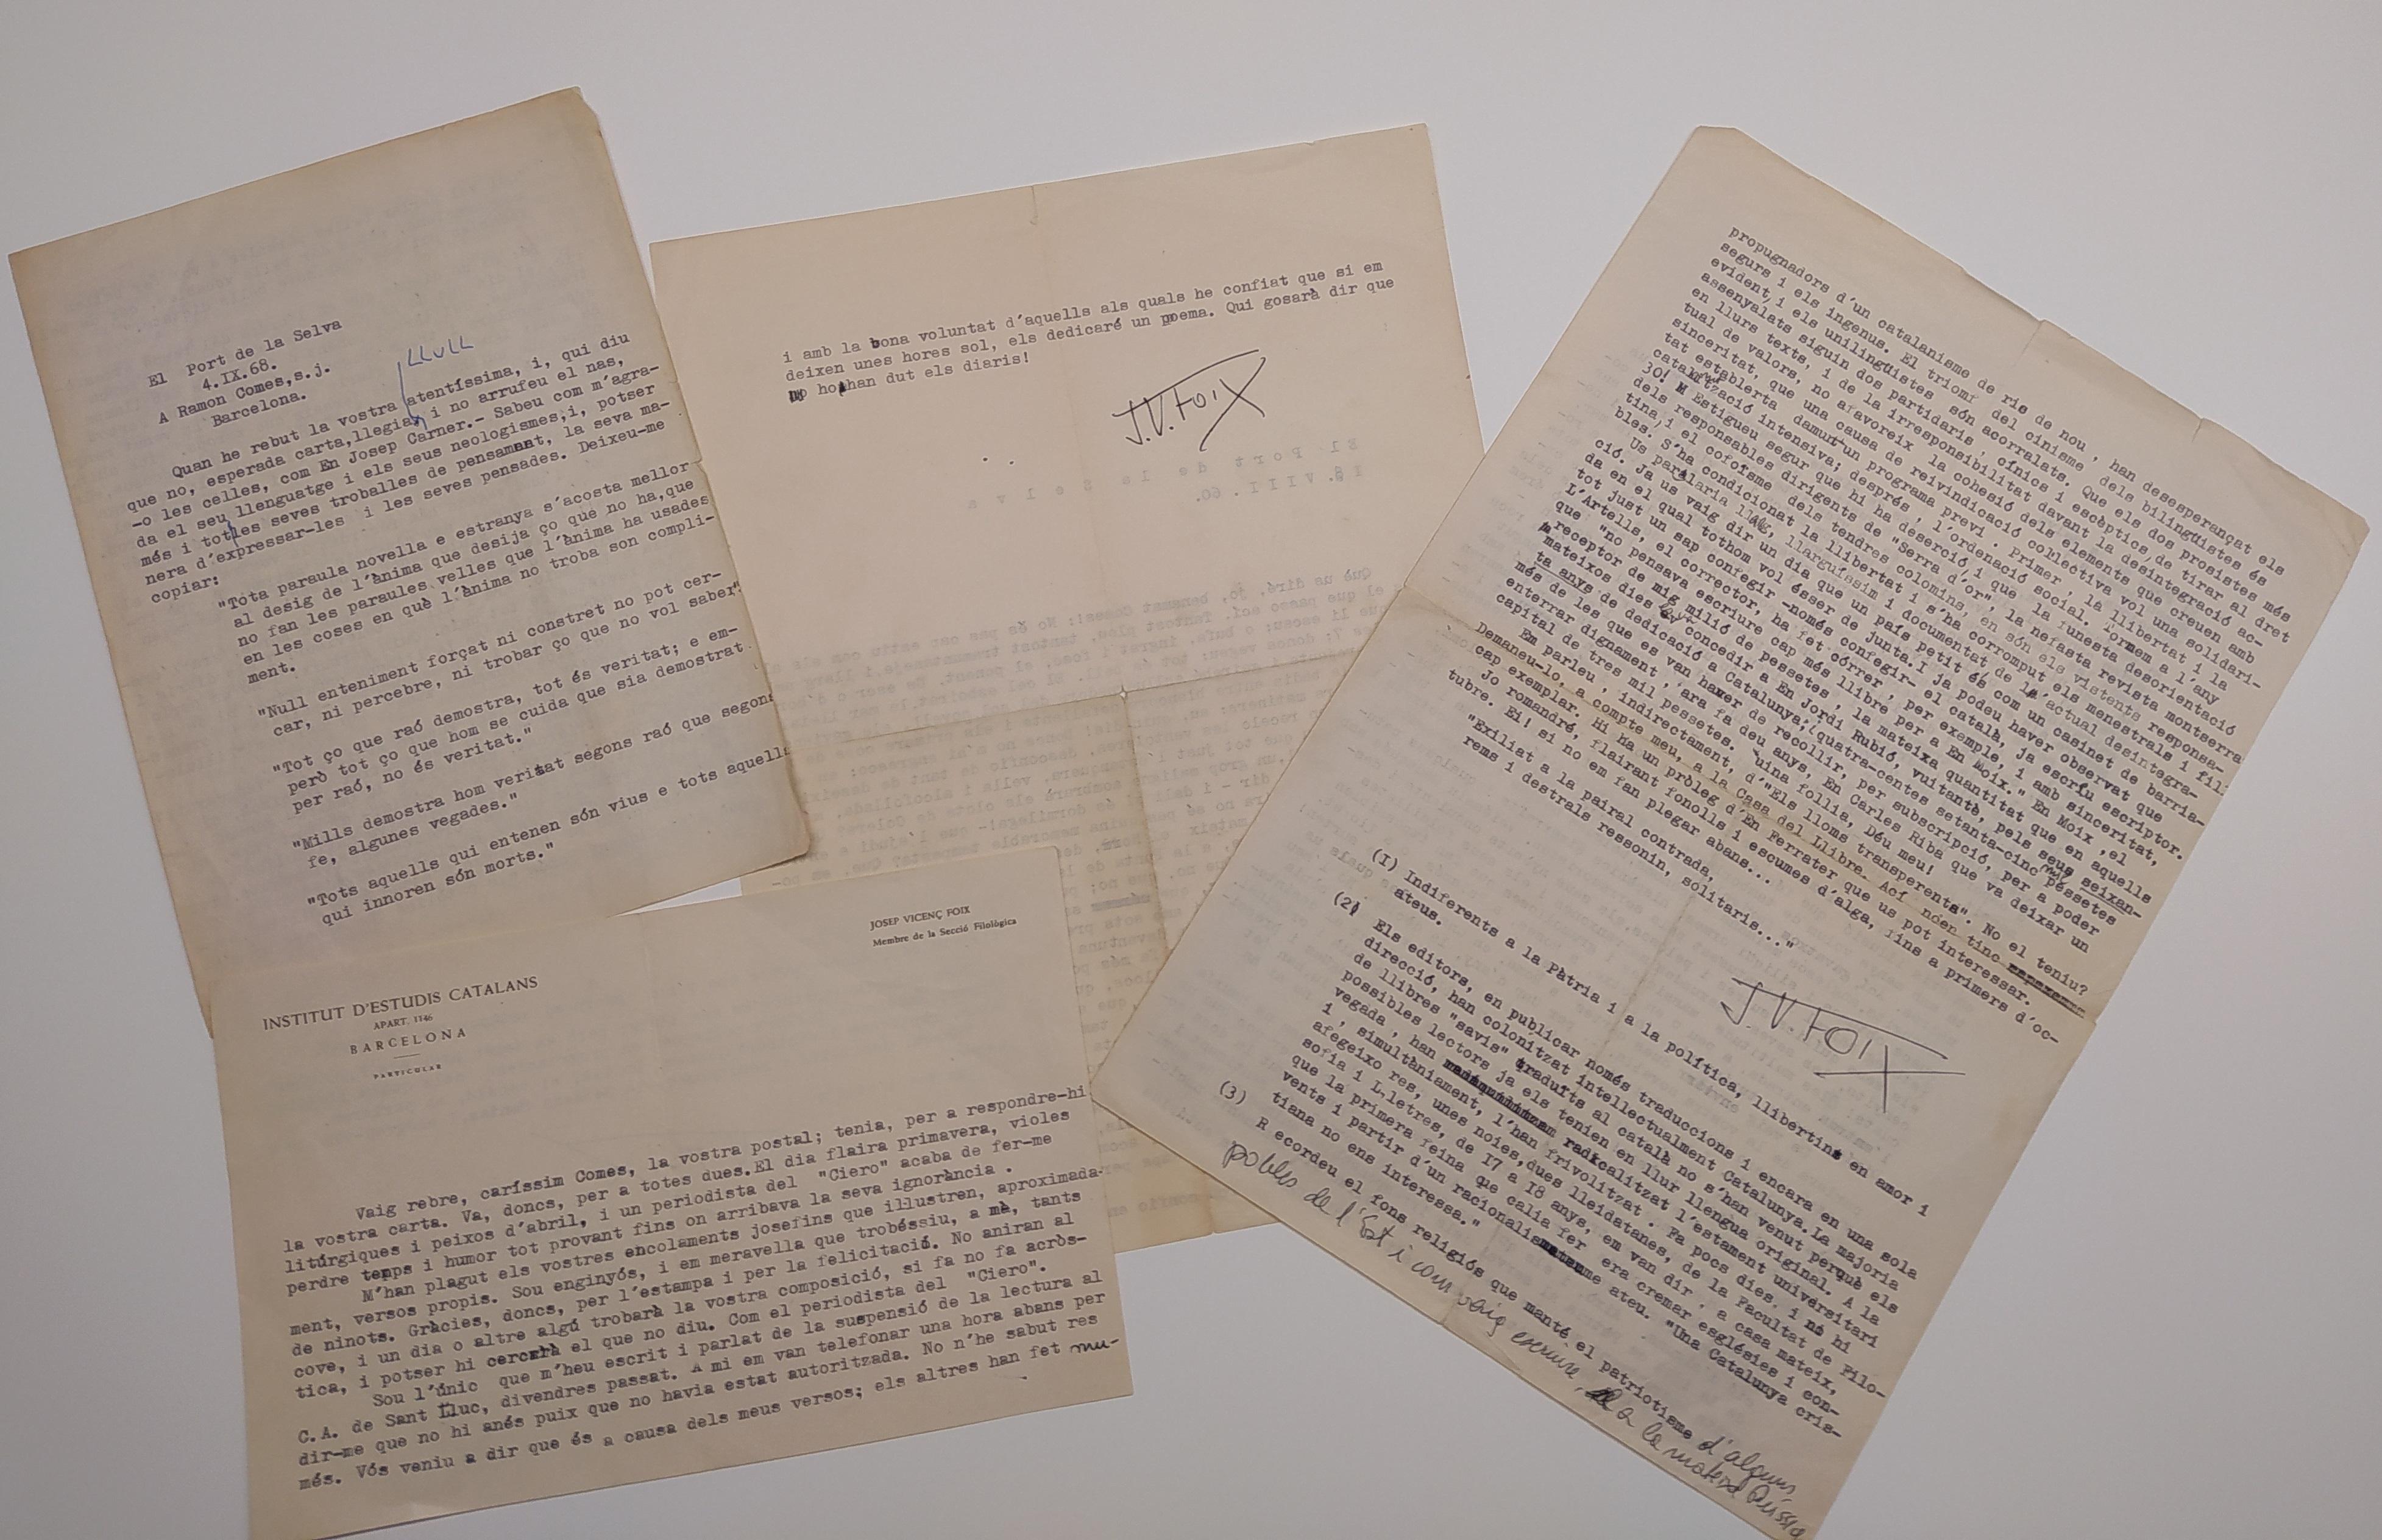 Cartes de J. V. Foix rebudes per Ramon Comas